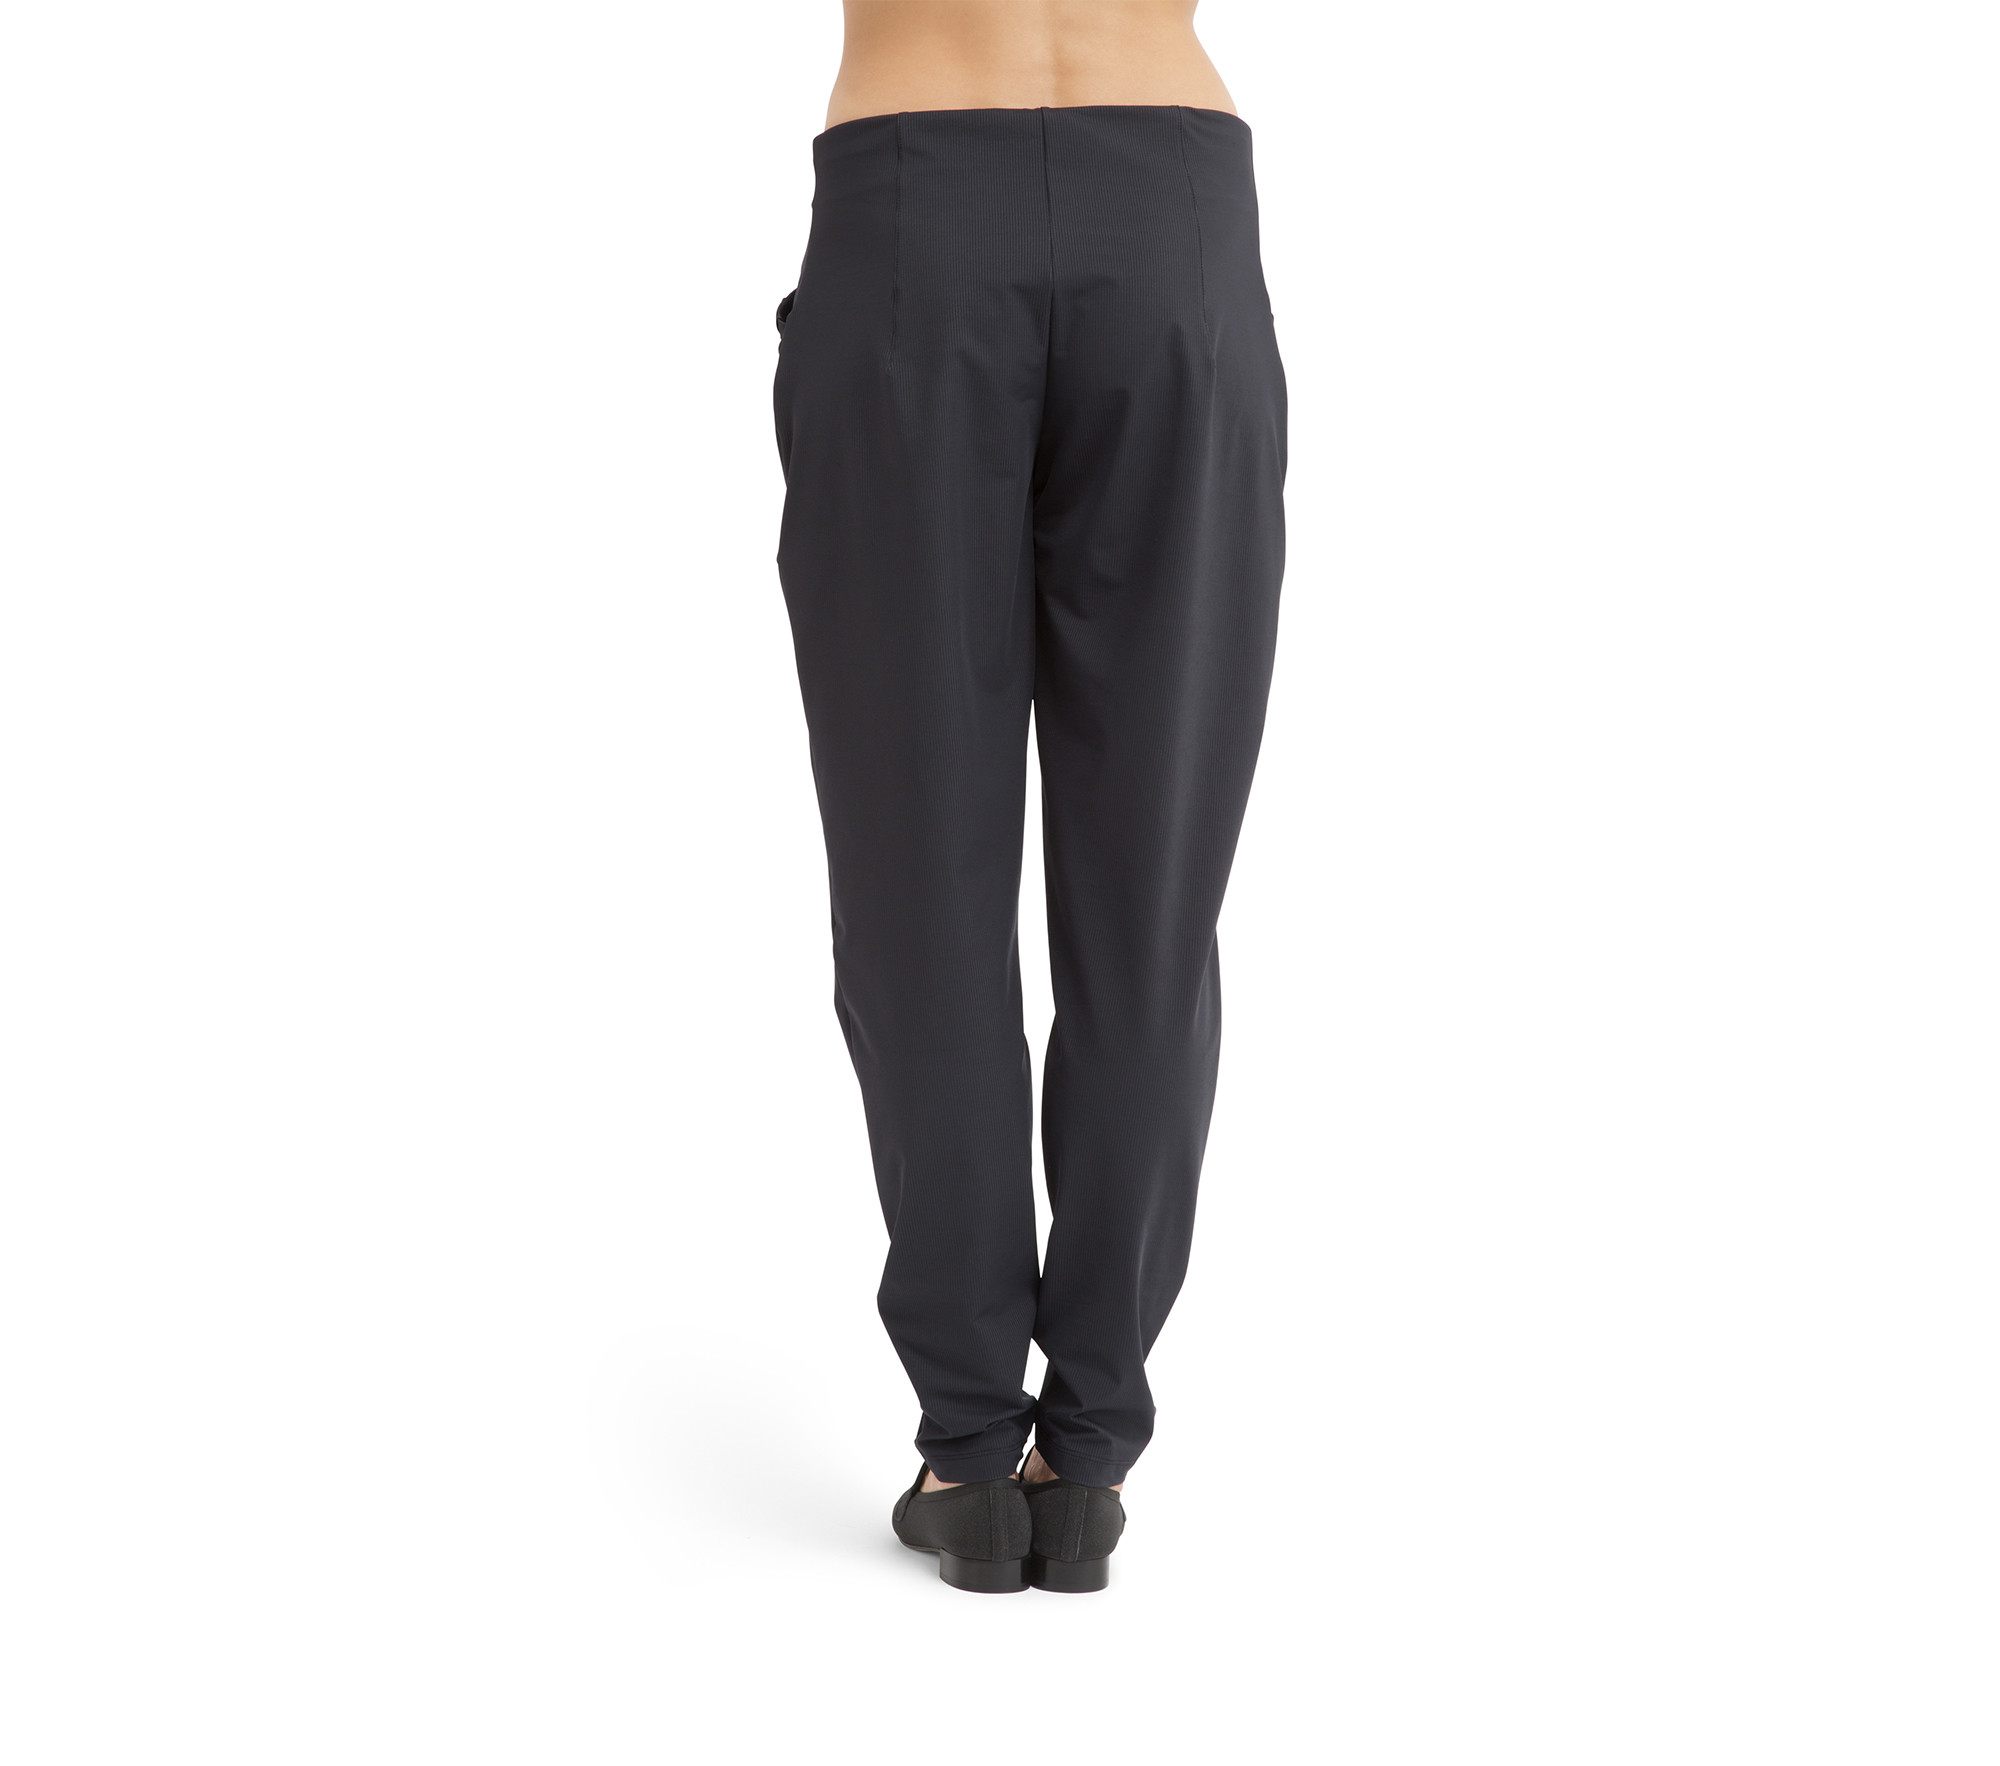 Pantalon stretch taille haute